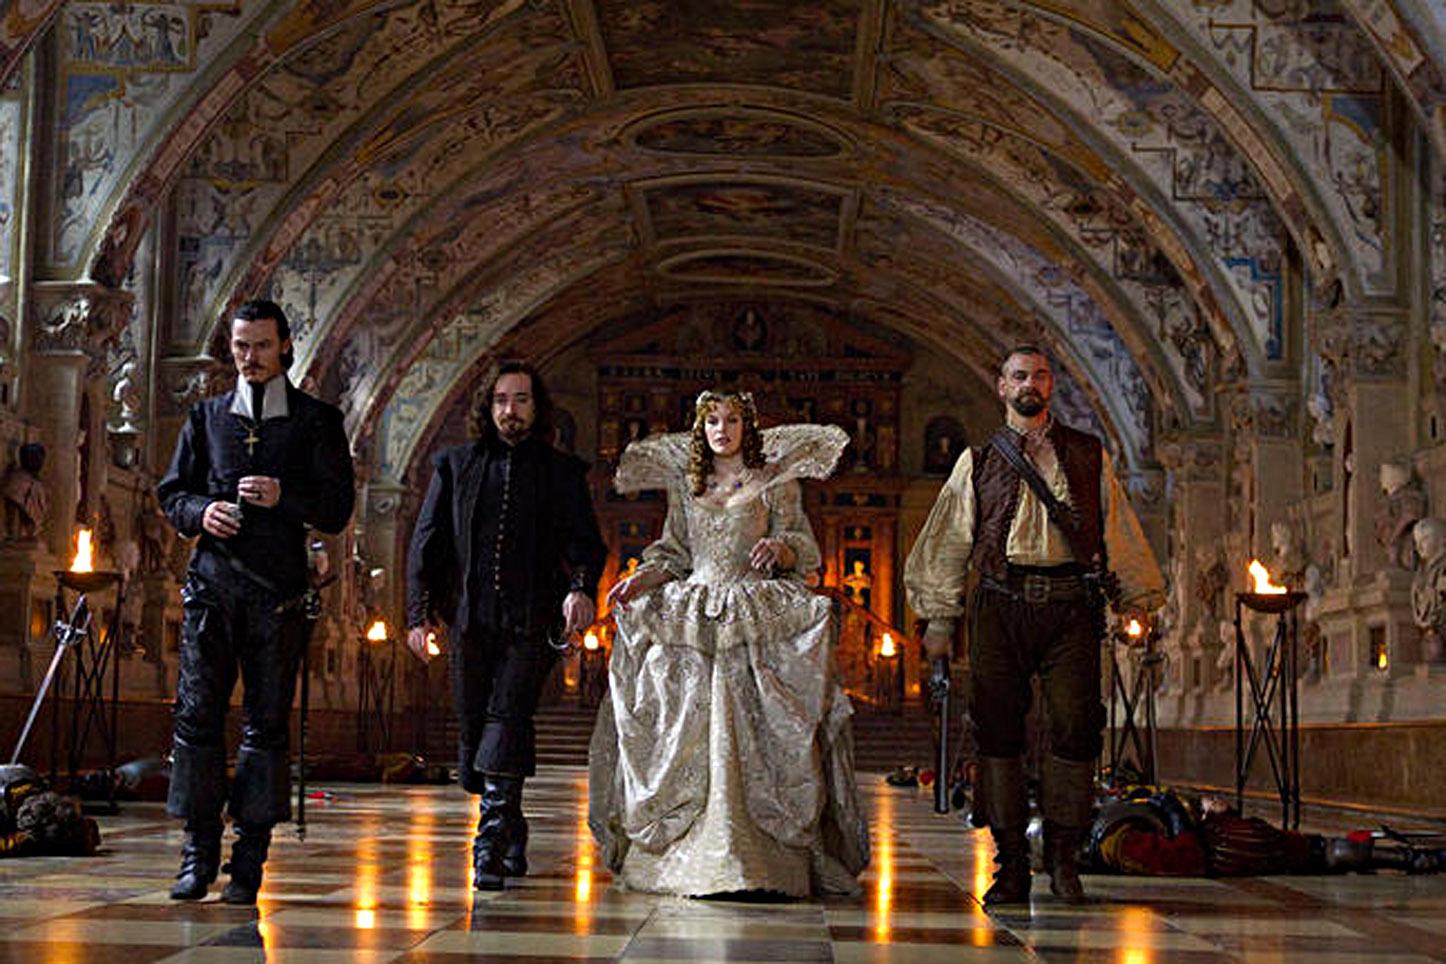 http://3.bp.blogspot.com/-REogYuXAZXs/Tm2gAHVNcTI/AAAAAAAABQ0/xcX9YtXkPpA/s1600/New+three+musketeers+2011+villains+Duke+of+Buckingham+orlando+bloom+Milady+de+Winter+Milla+Jovovich+Cardinal+Richelieu+Christoph+Waltz.jpg